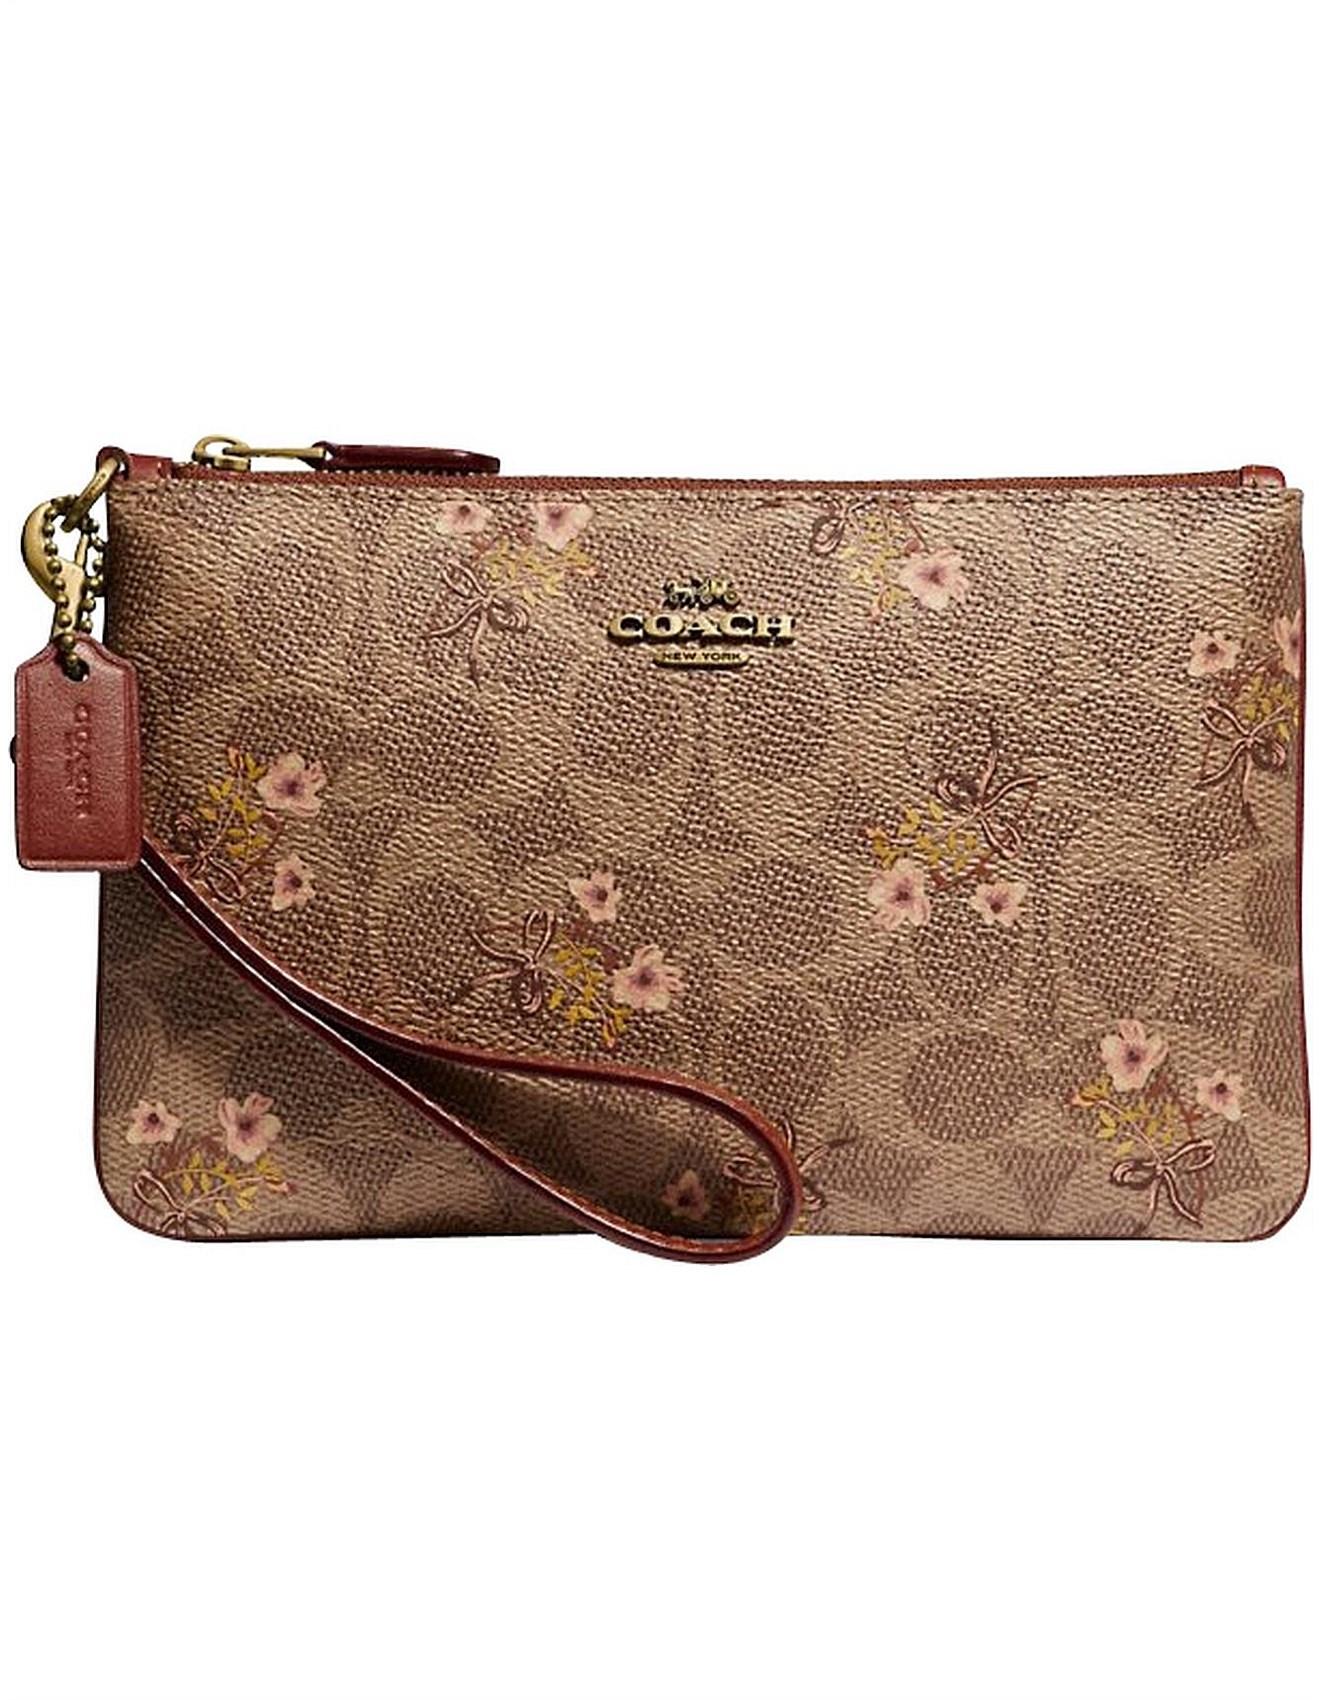 c2fabdd83fae3d Coach | Buy Coach Bags, Handbags & Wallets Online | David Jones ...